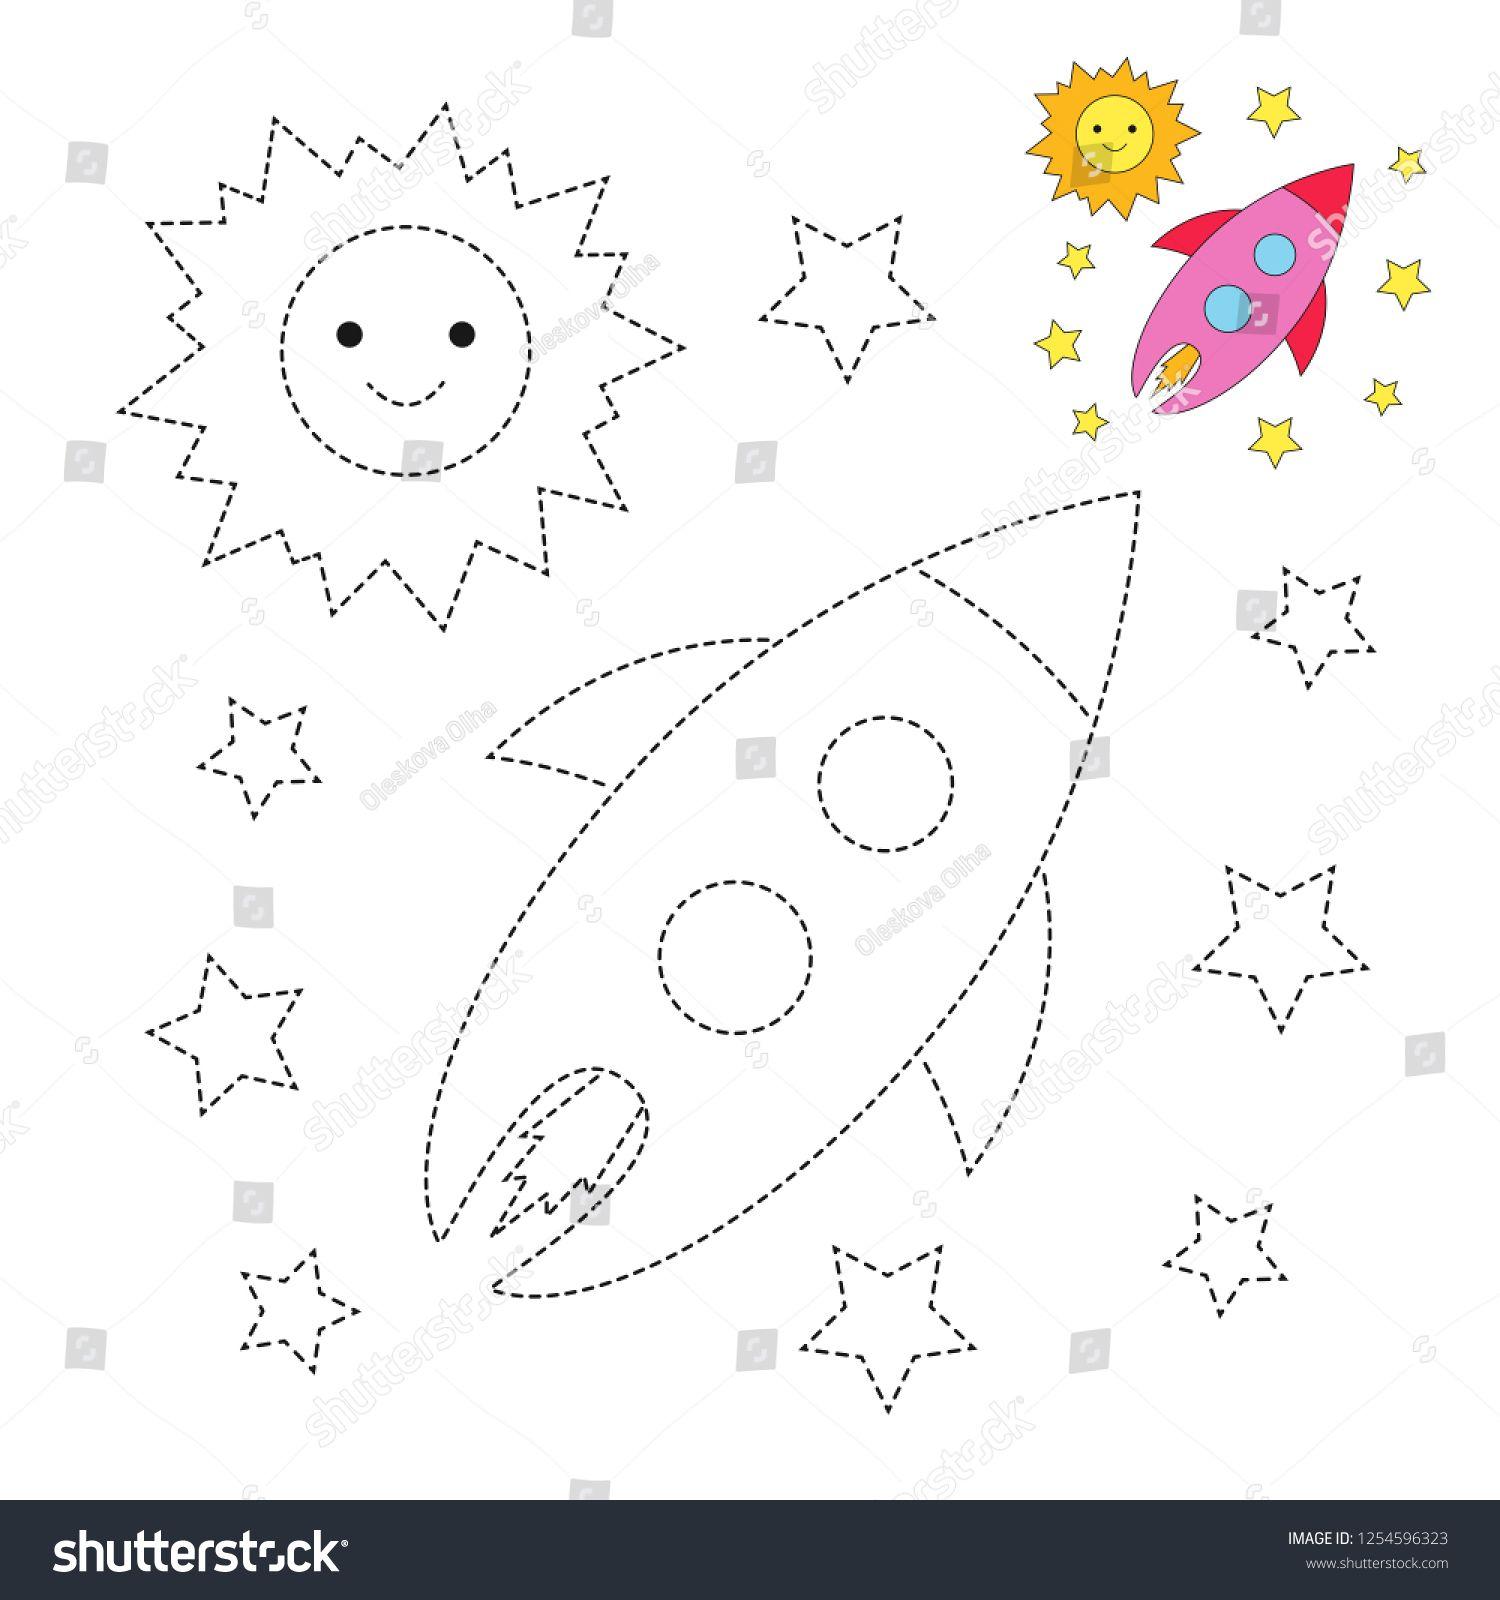 Vector Drawing Worksheet For Preschool Kids With Easy